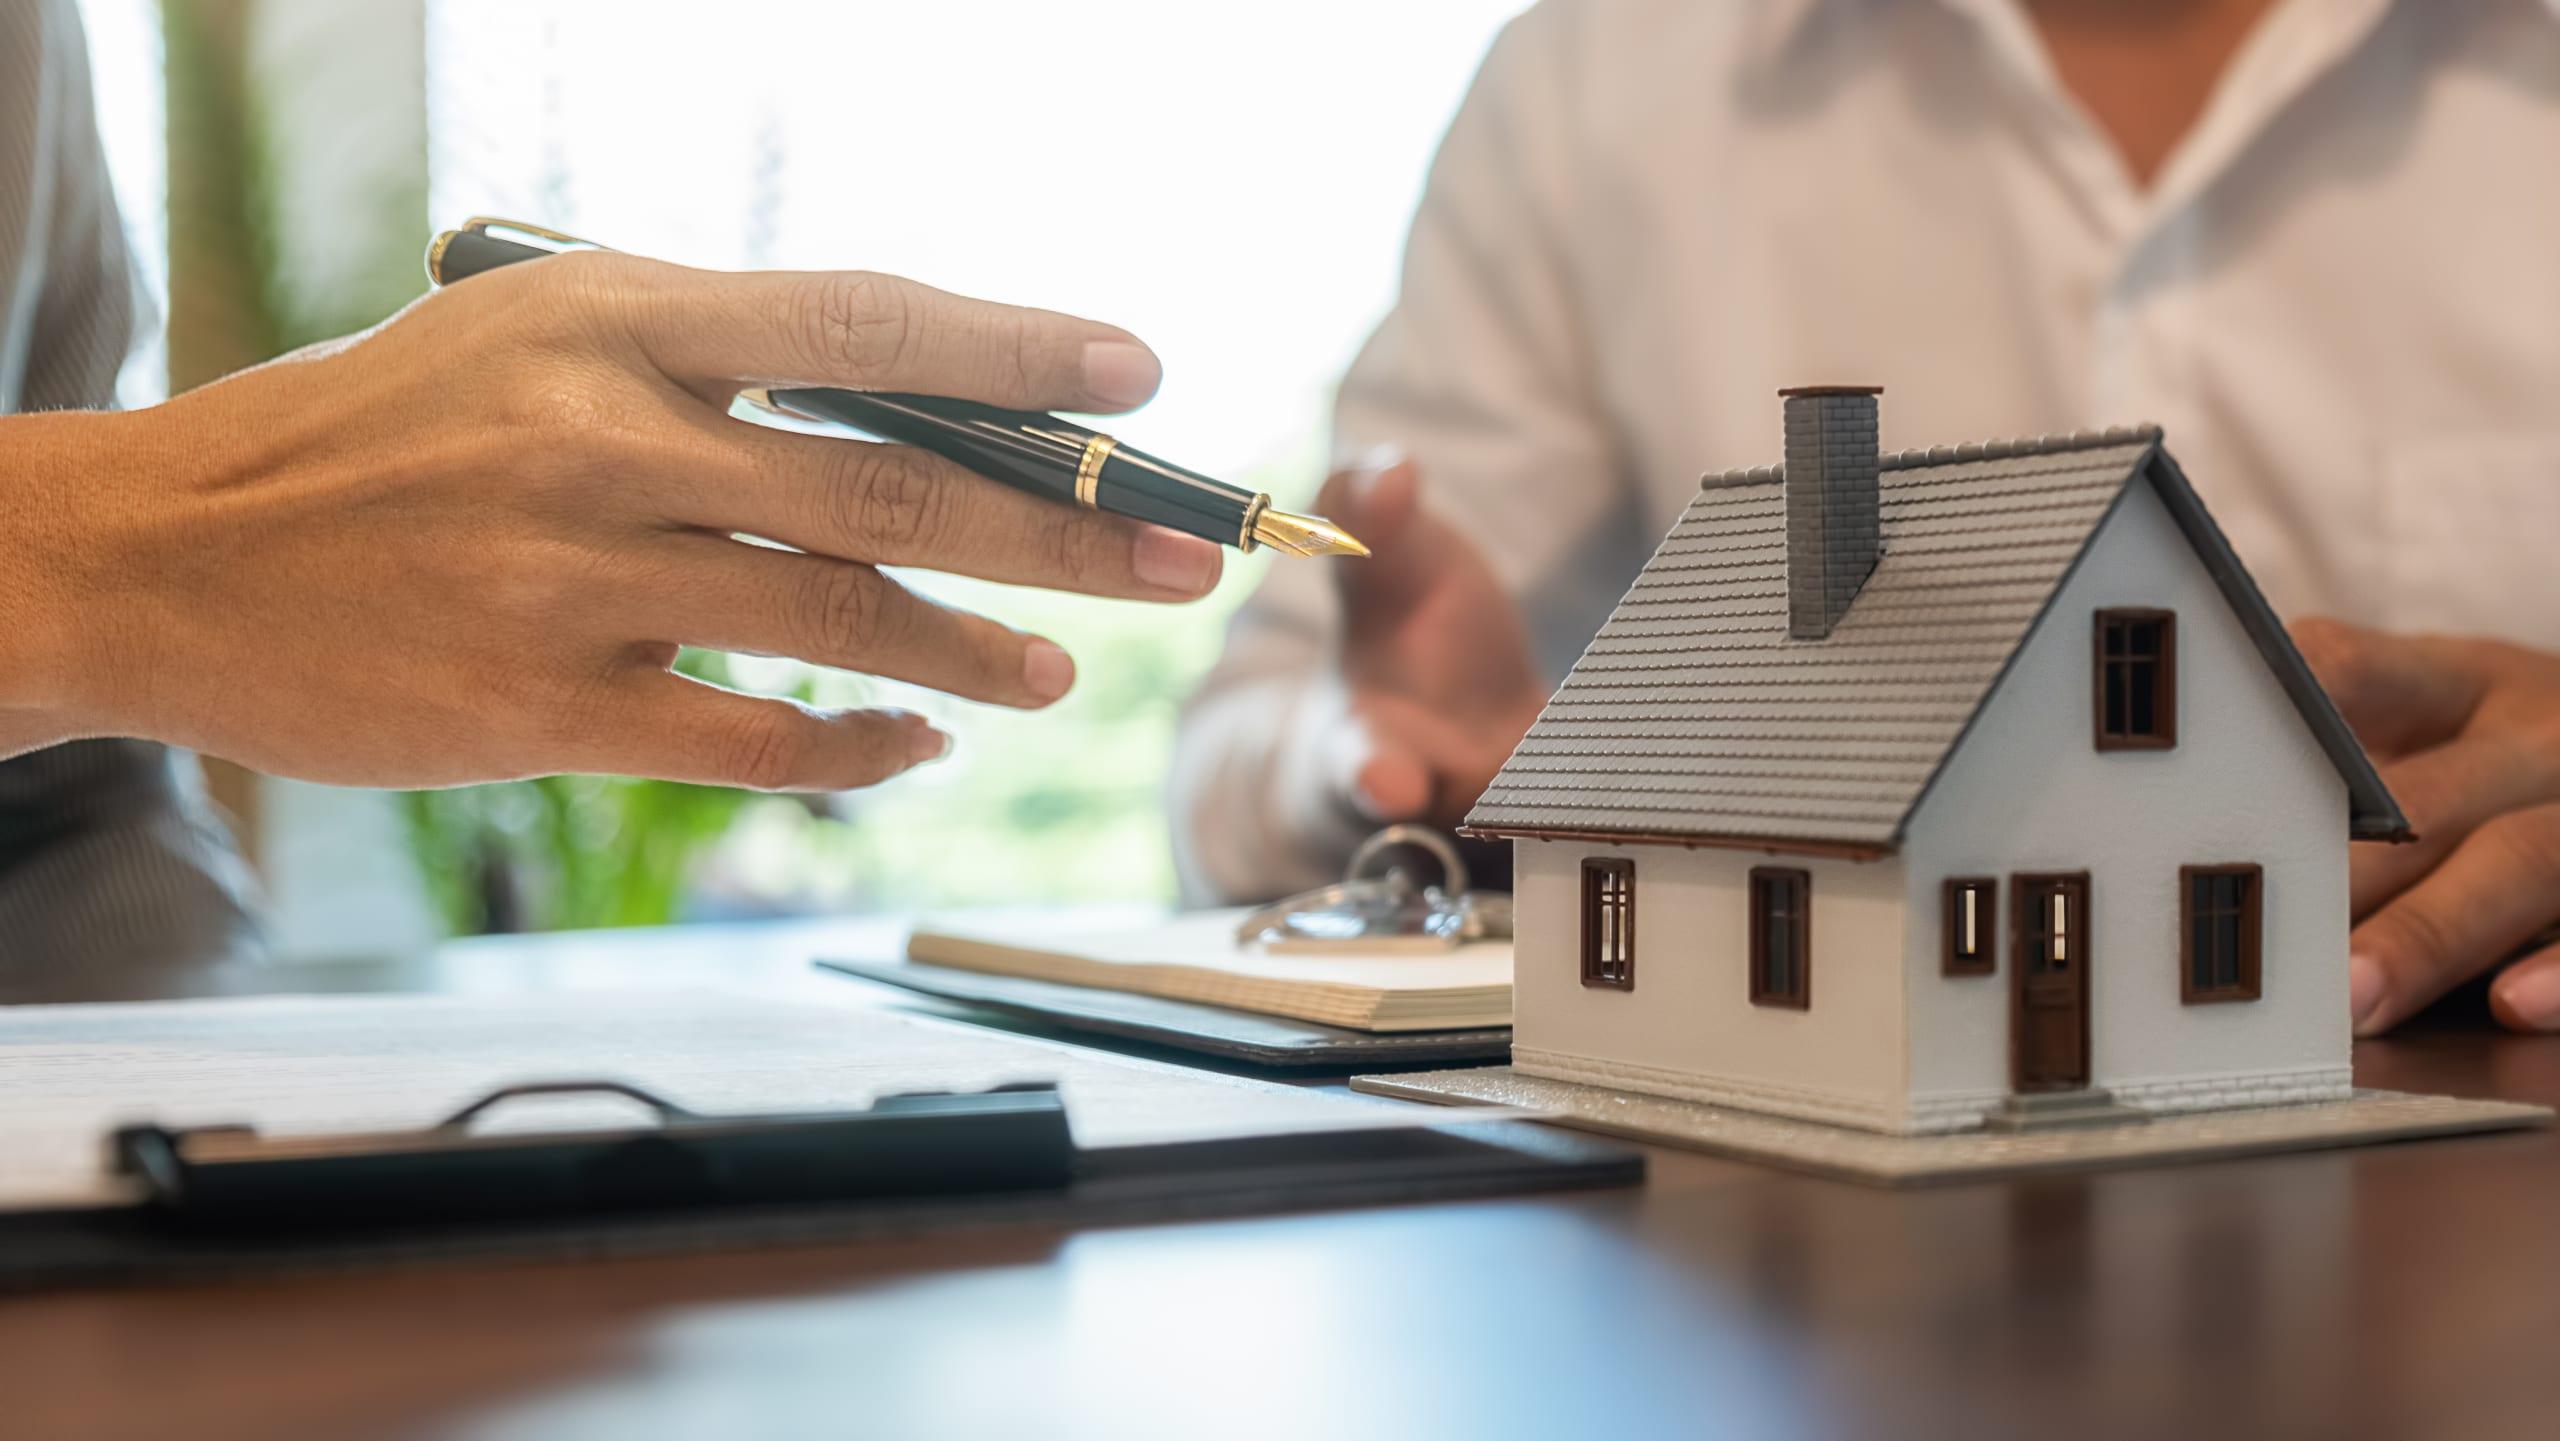 Comprar casa tasas interés